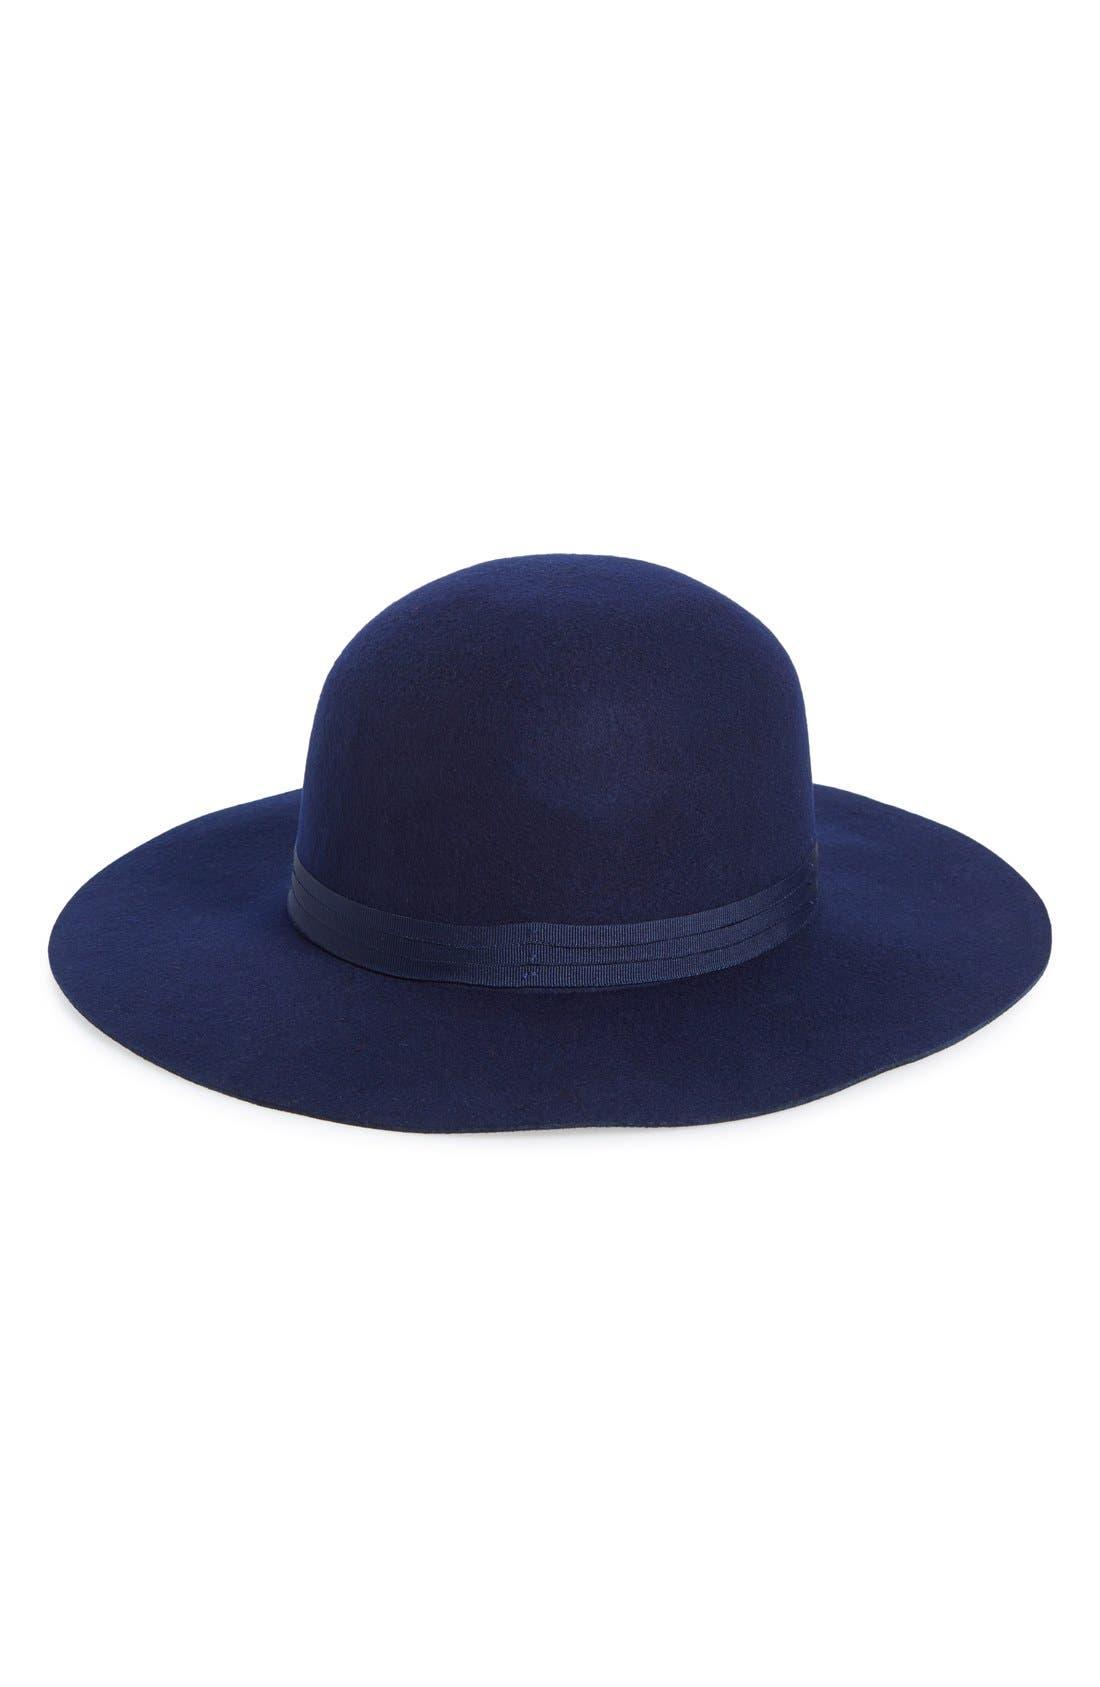 Main Image - Brixton'Magdalena' Wide Brim Wool Felt Hat